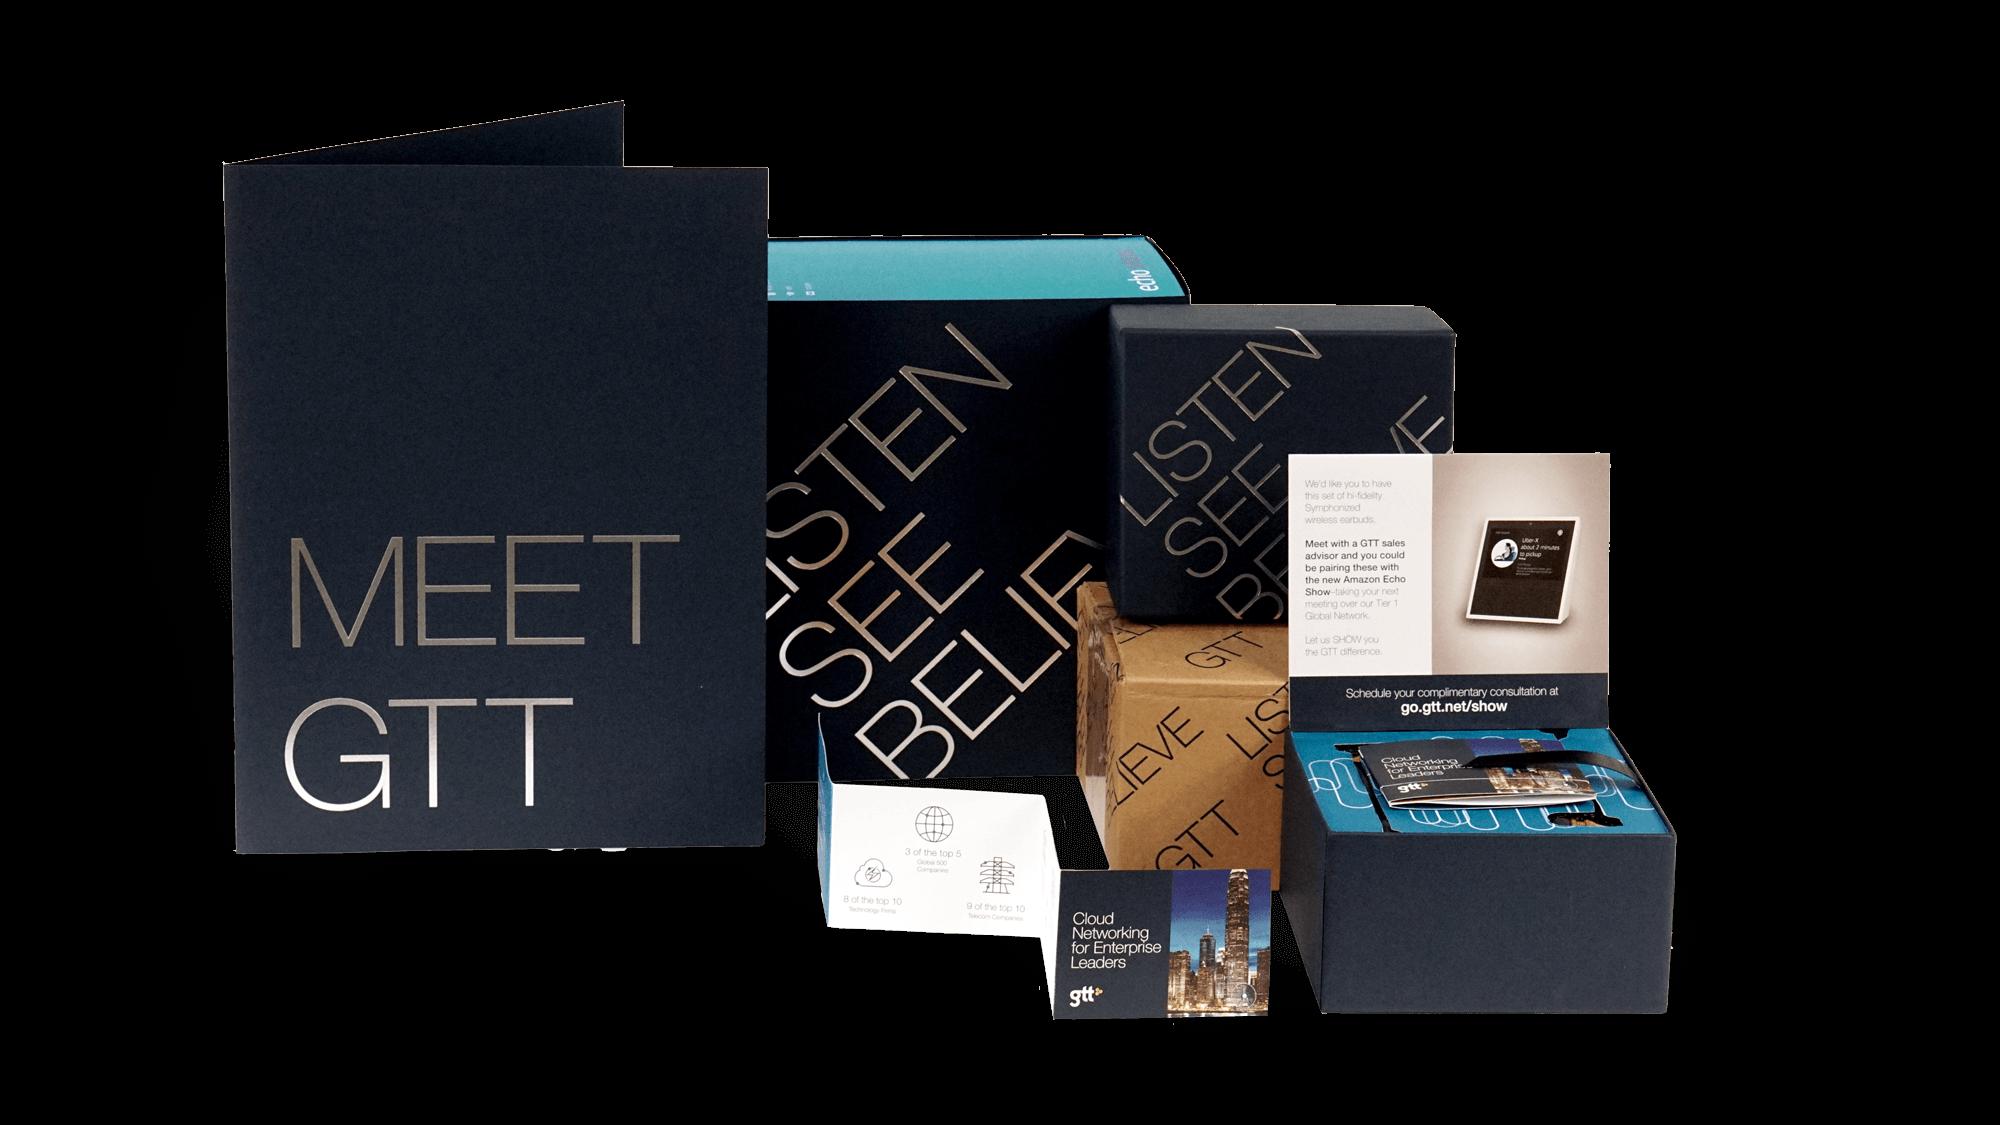 GTT: Account-Based Marketing & B2B Content Program